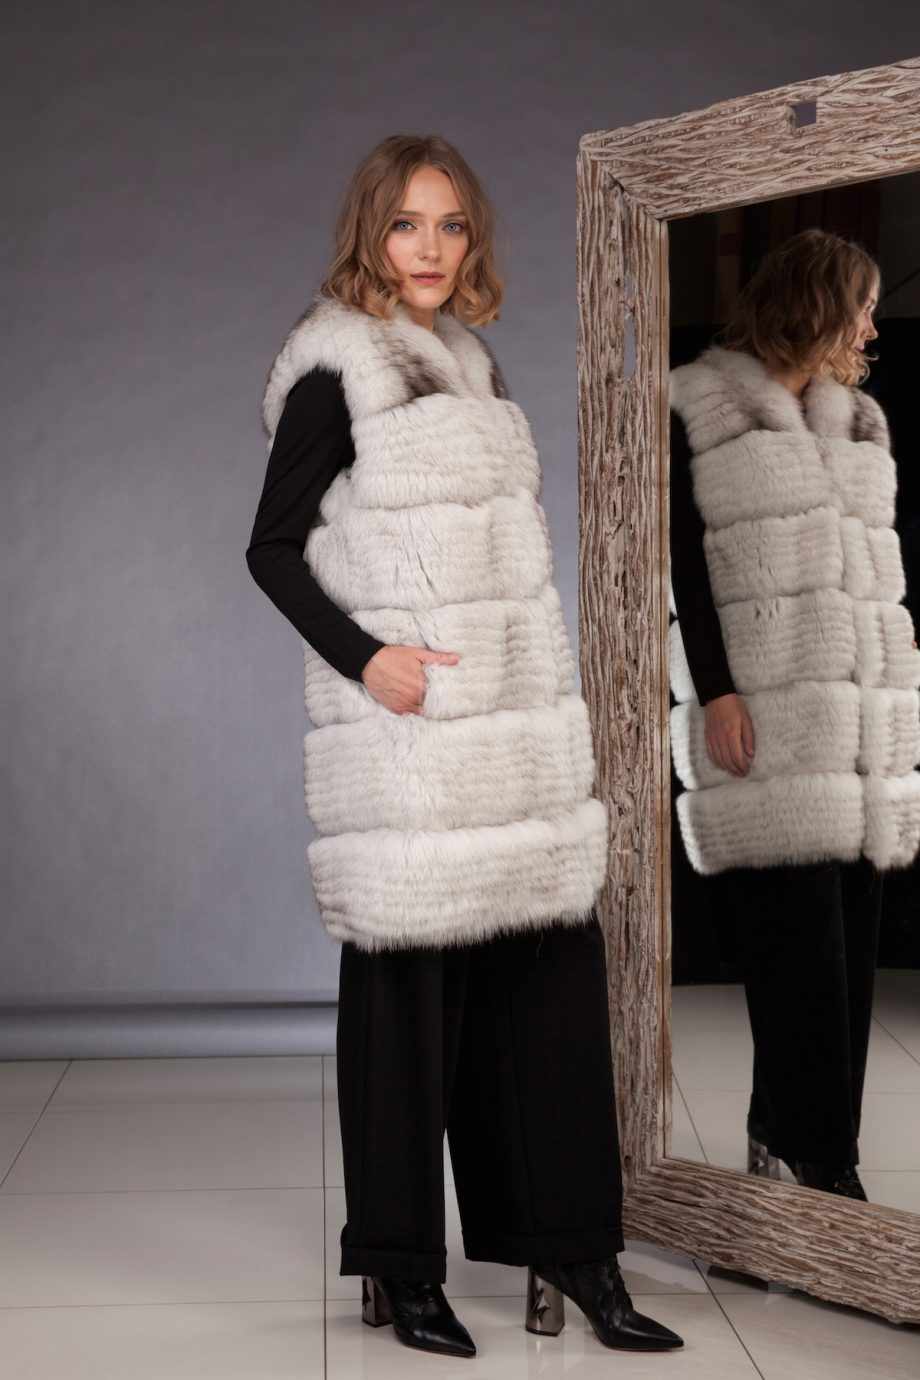 High quality northern fox fur vest made by SILTA MADA fur studio in Vilnius